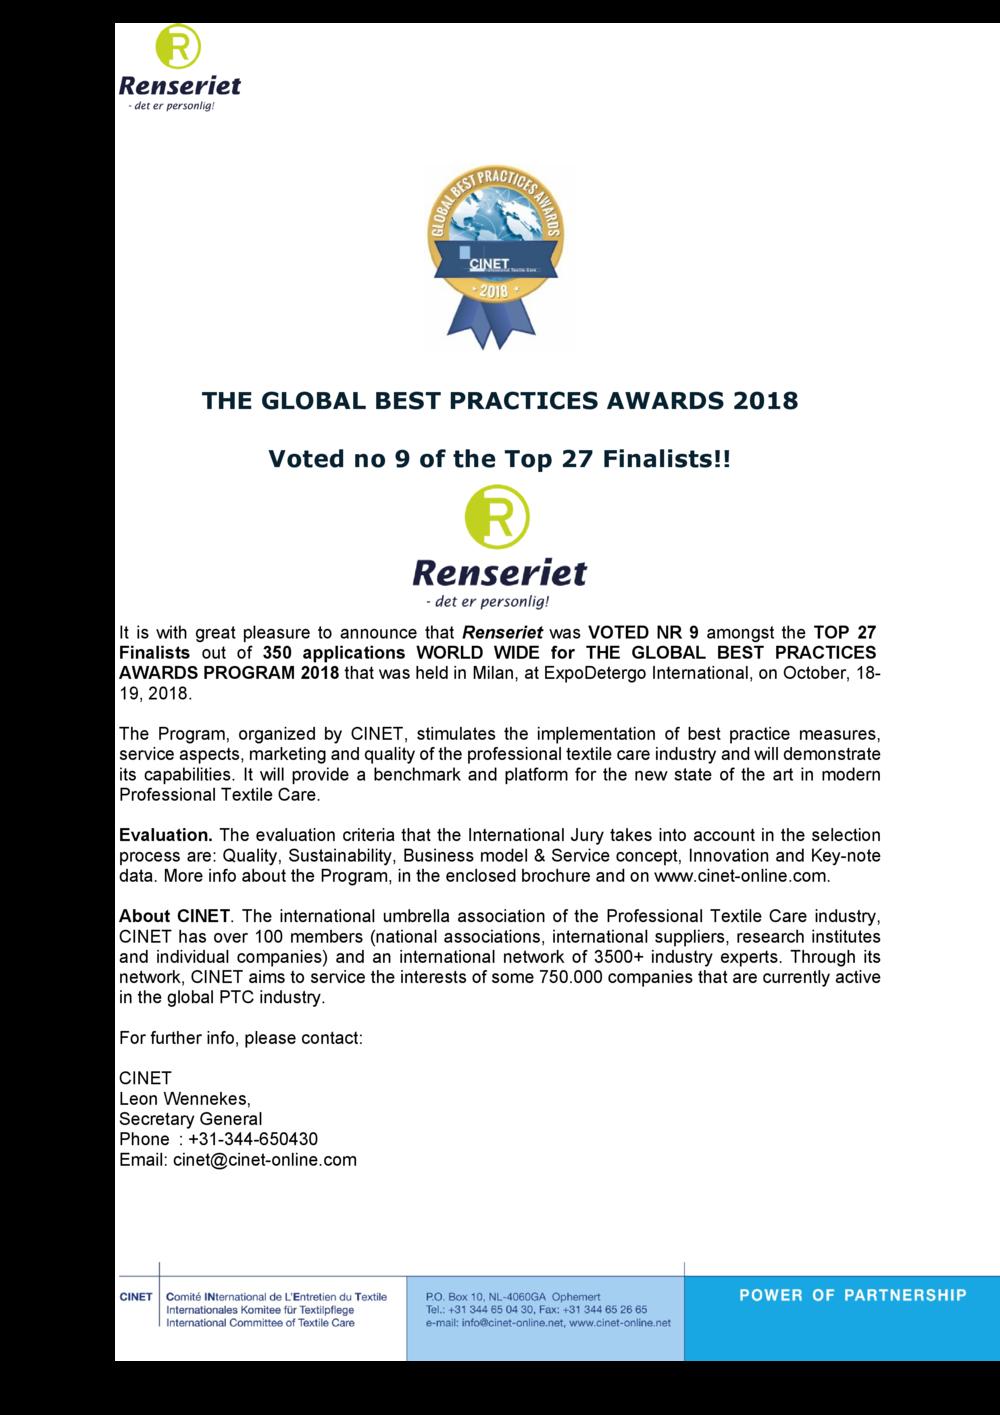 2018091302 PRESS RELEASE_GBPA18_FINALIST RENSERIET.png